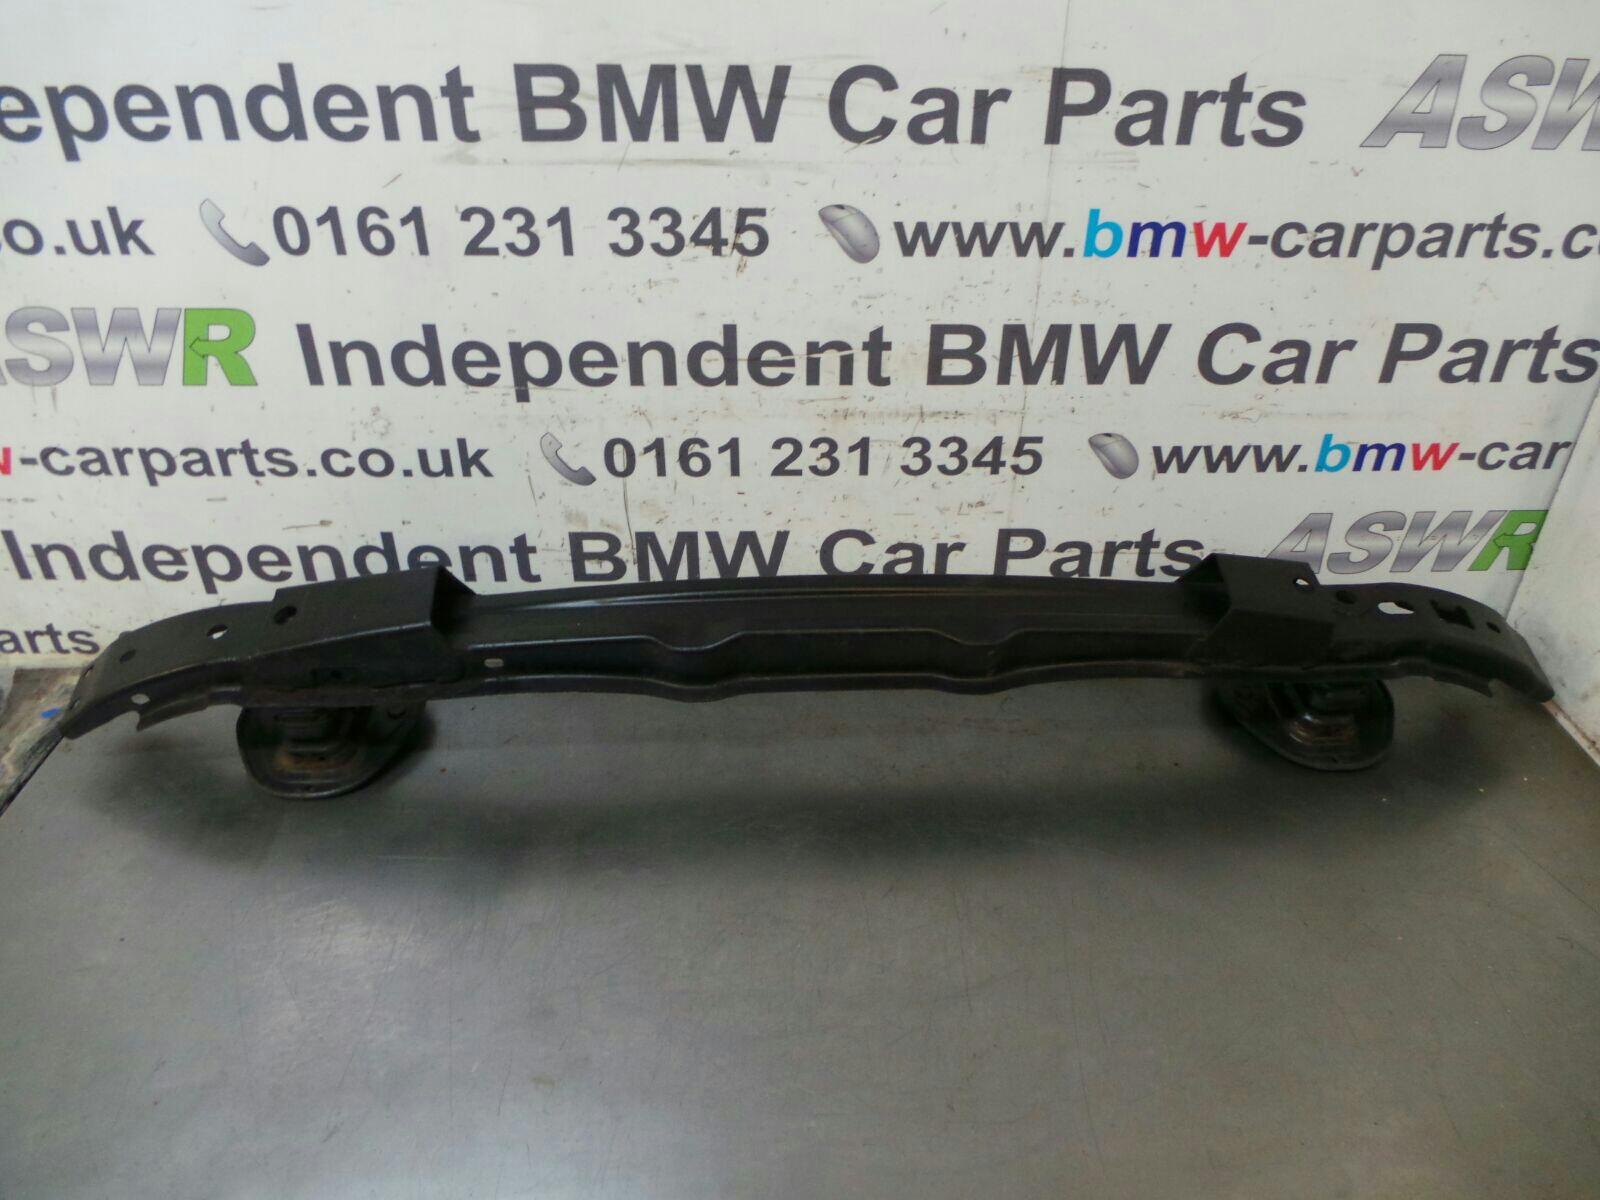 Bmw E85 E86 Z4 Rear Bumper Carrier Support 51127016072